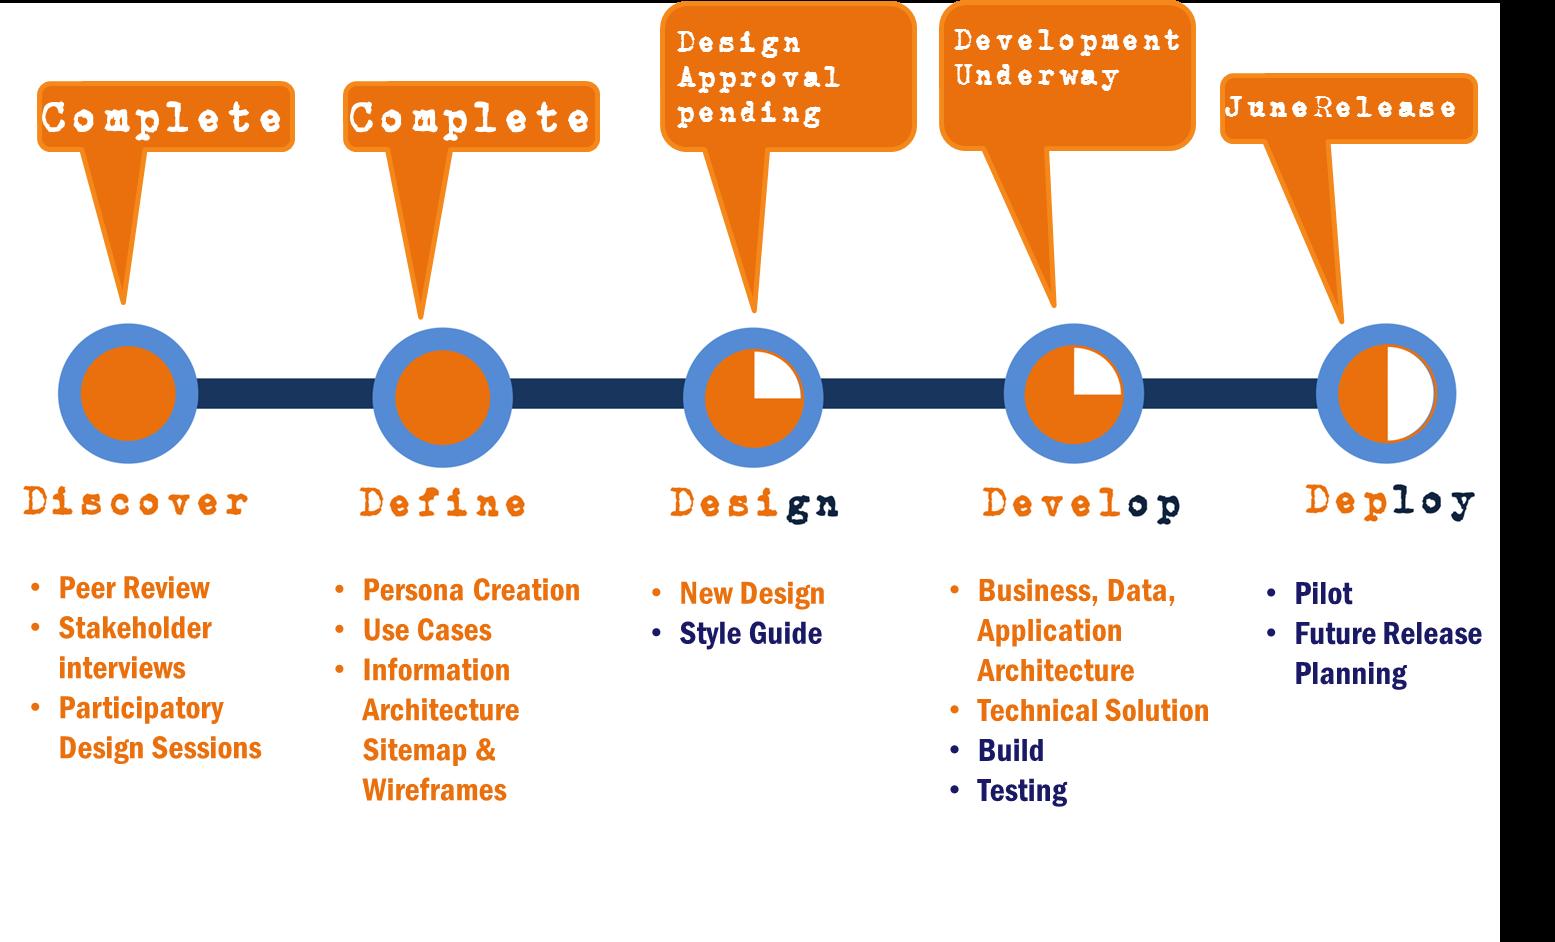 5d Home Design Online Consult Coniferous A Simple Visual Timeline Visualization